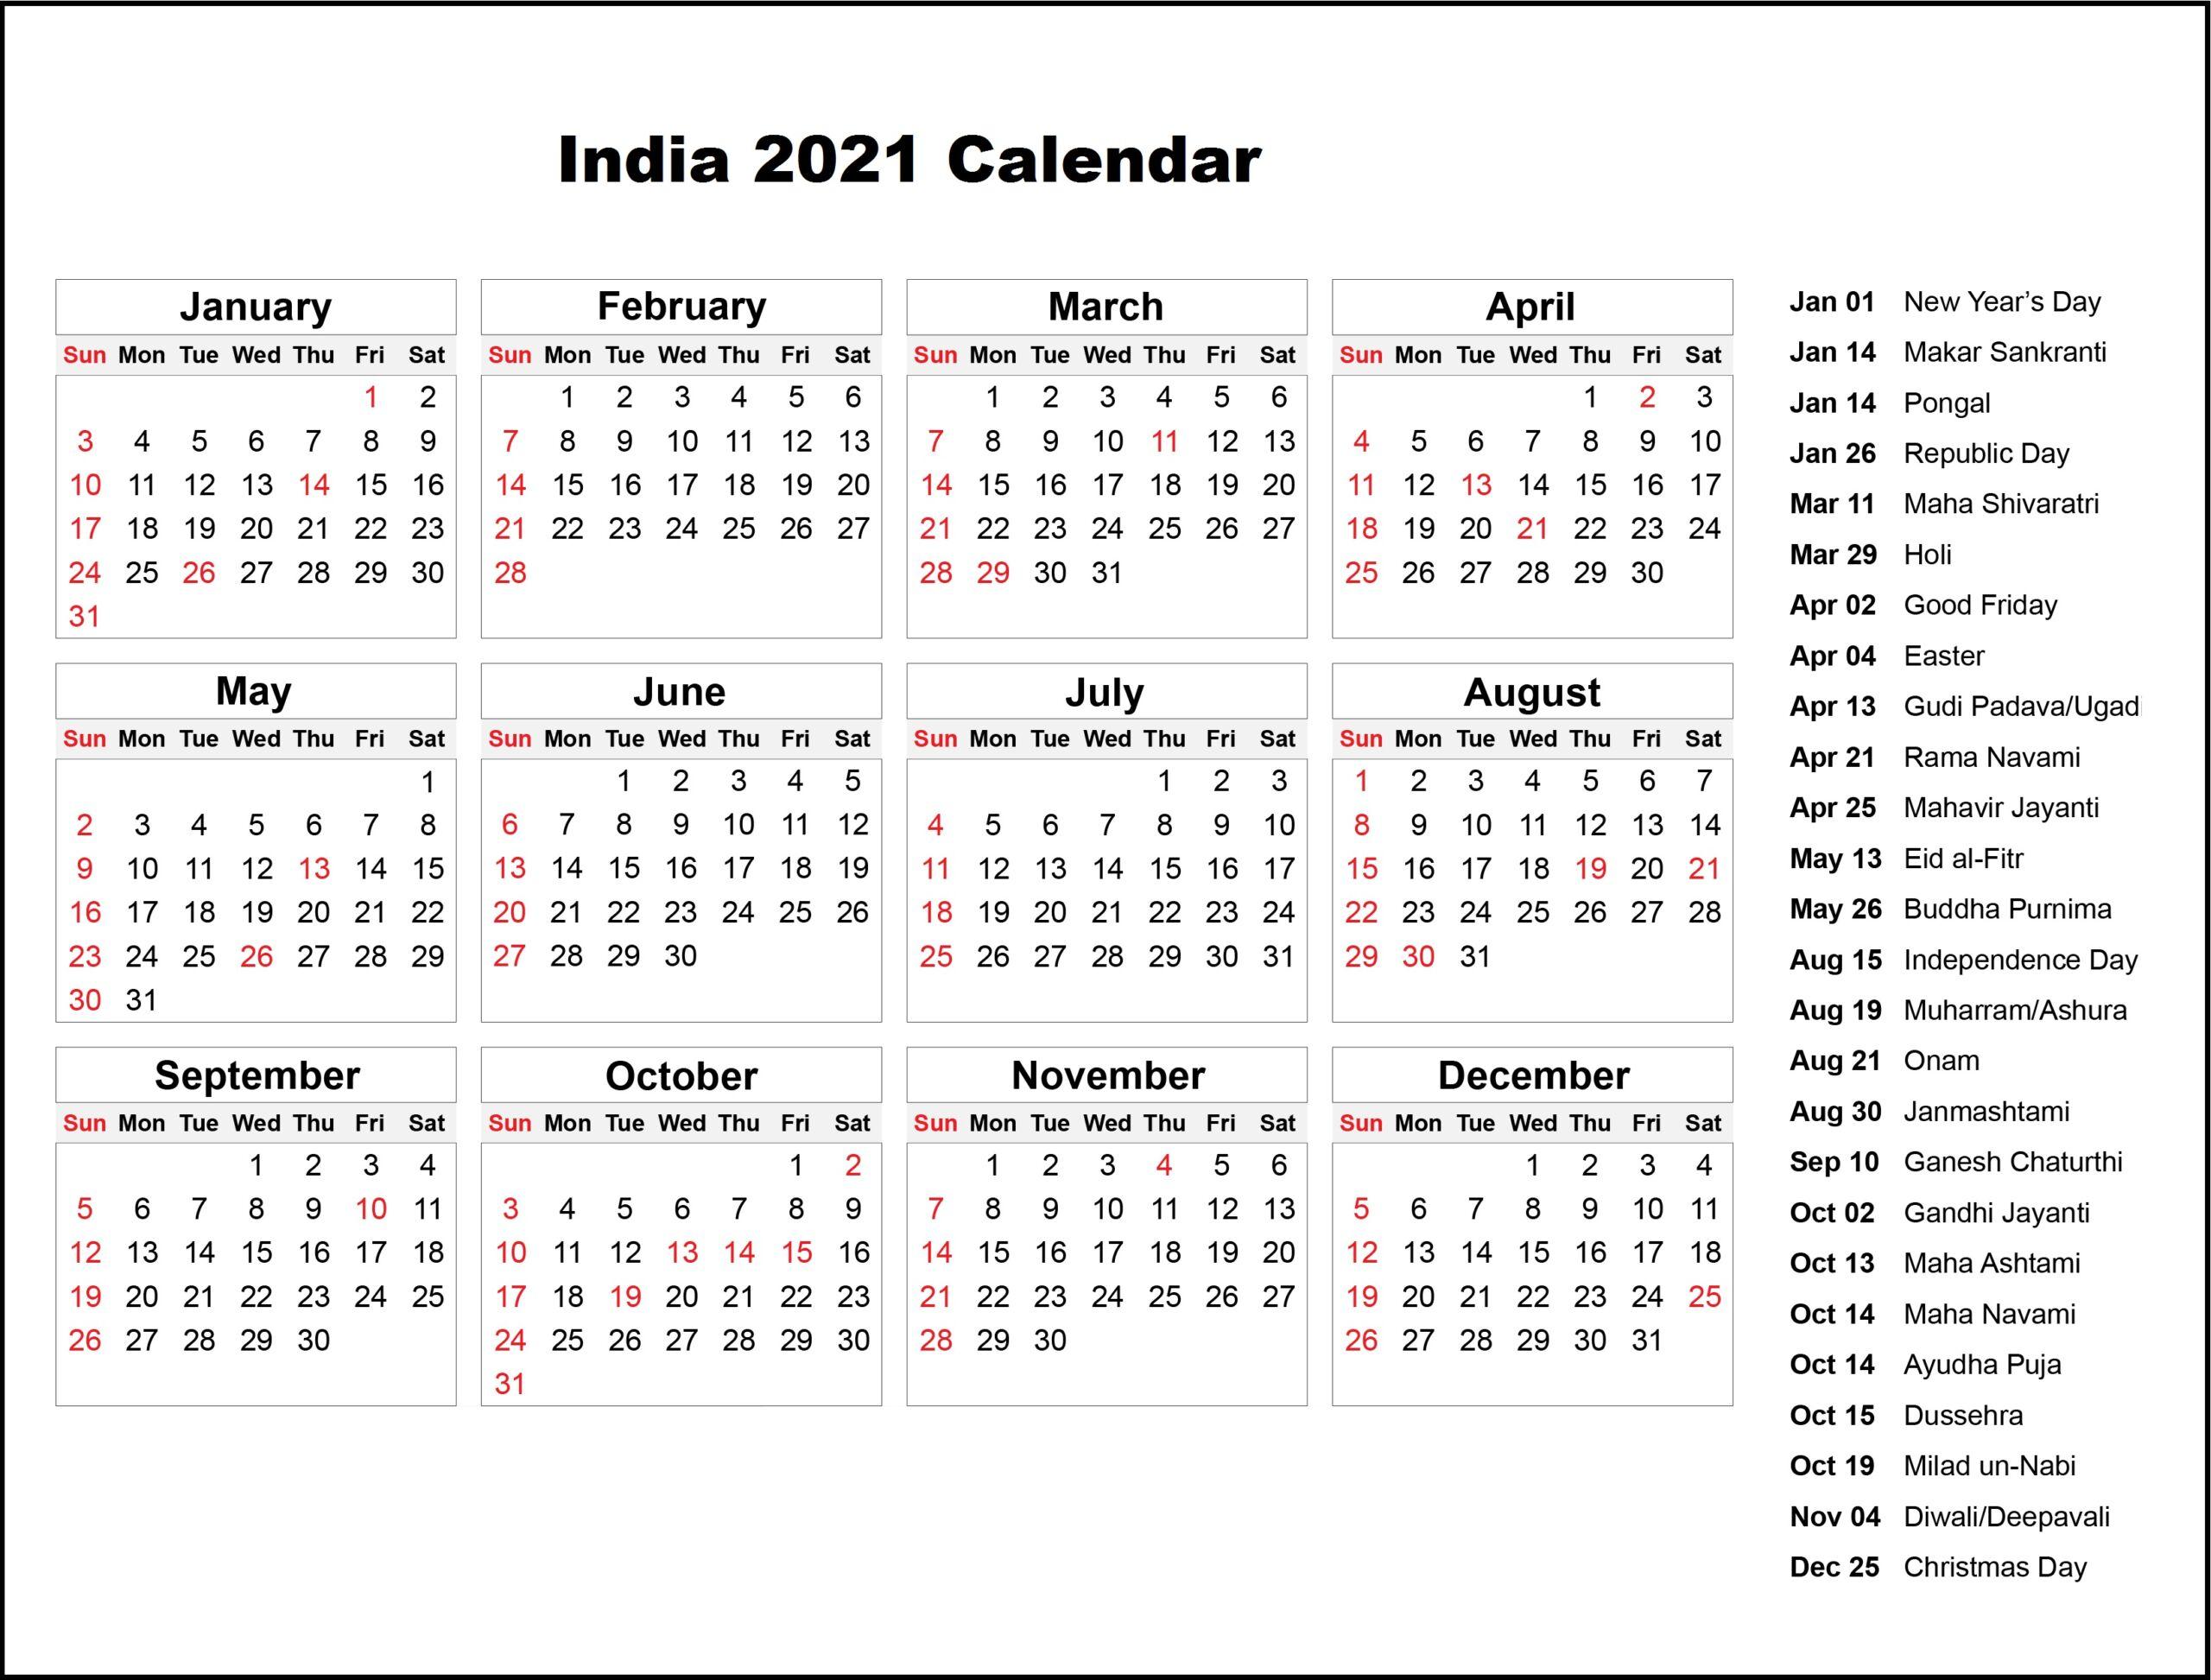 Public Holidays in India 2021